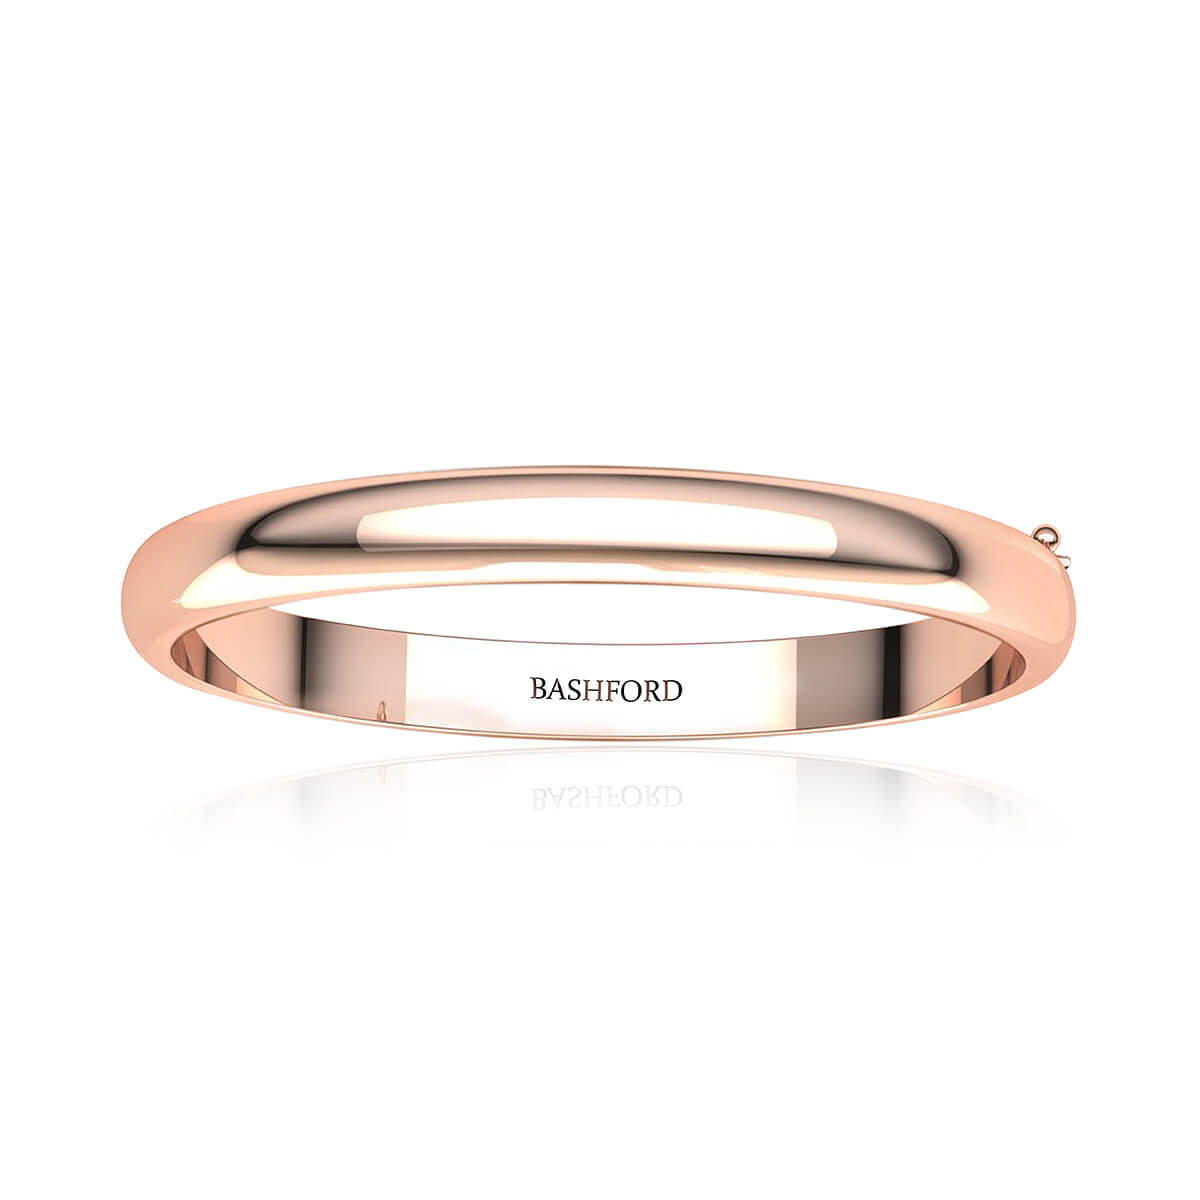 Bashford Ora Bangle Bracelet